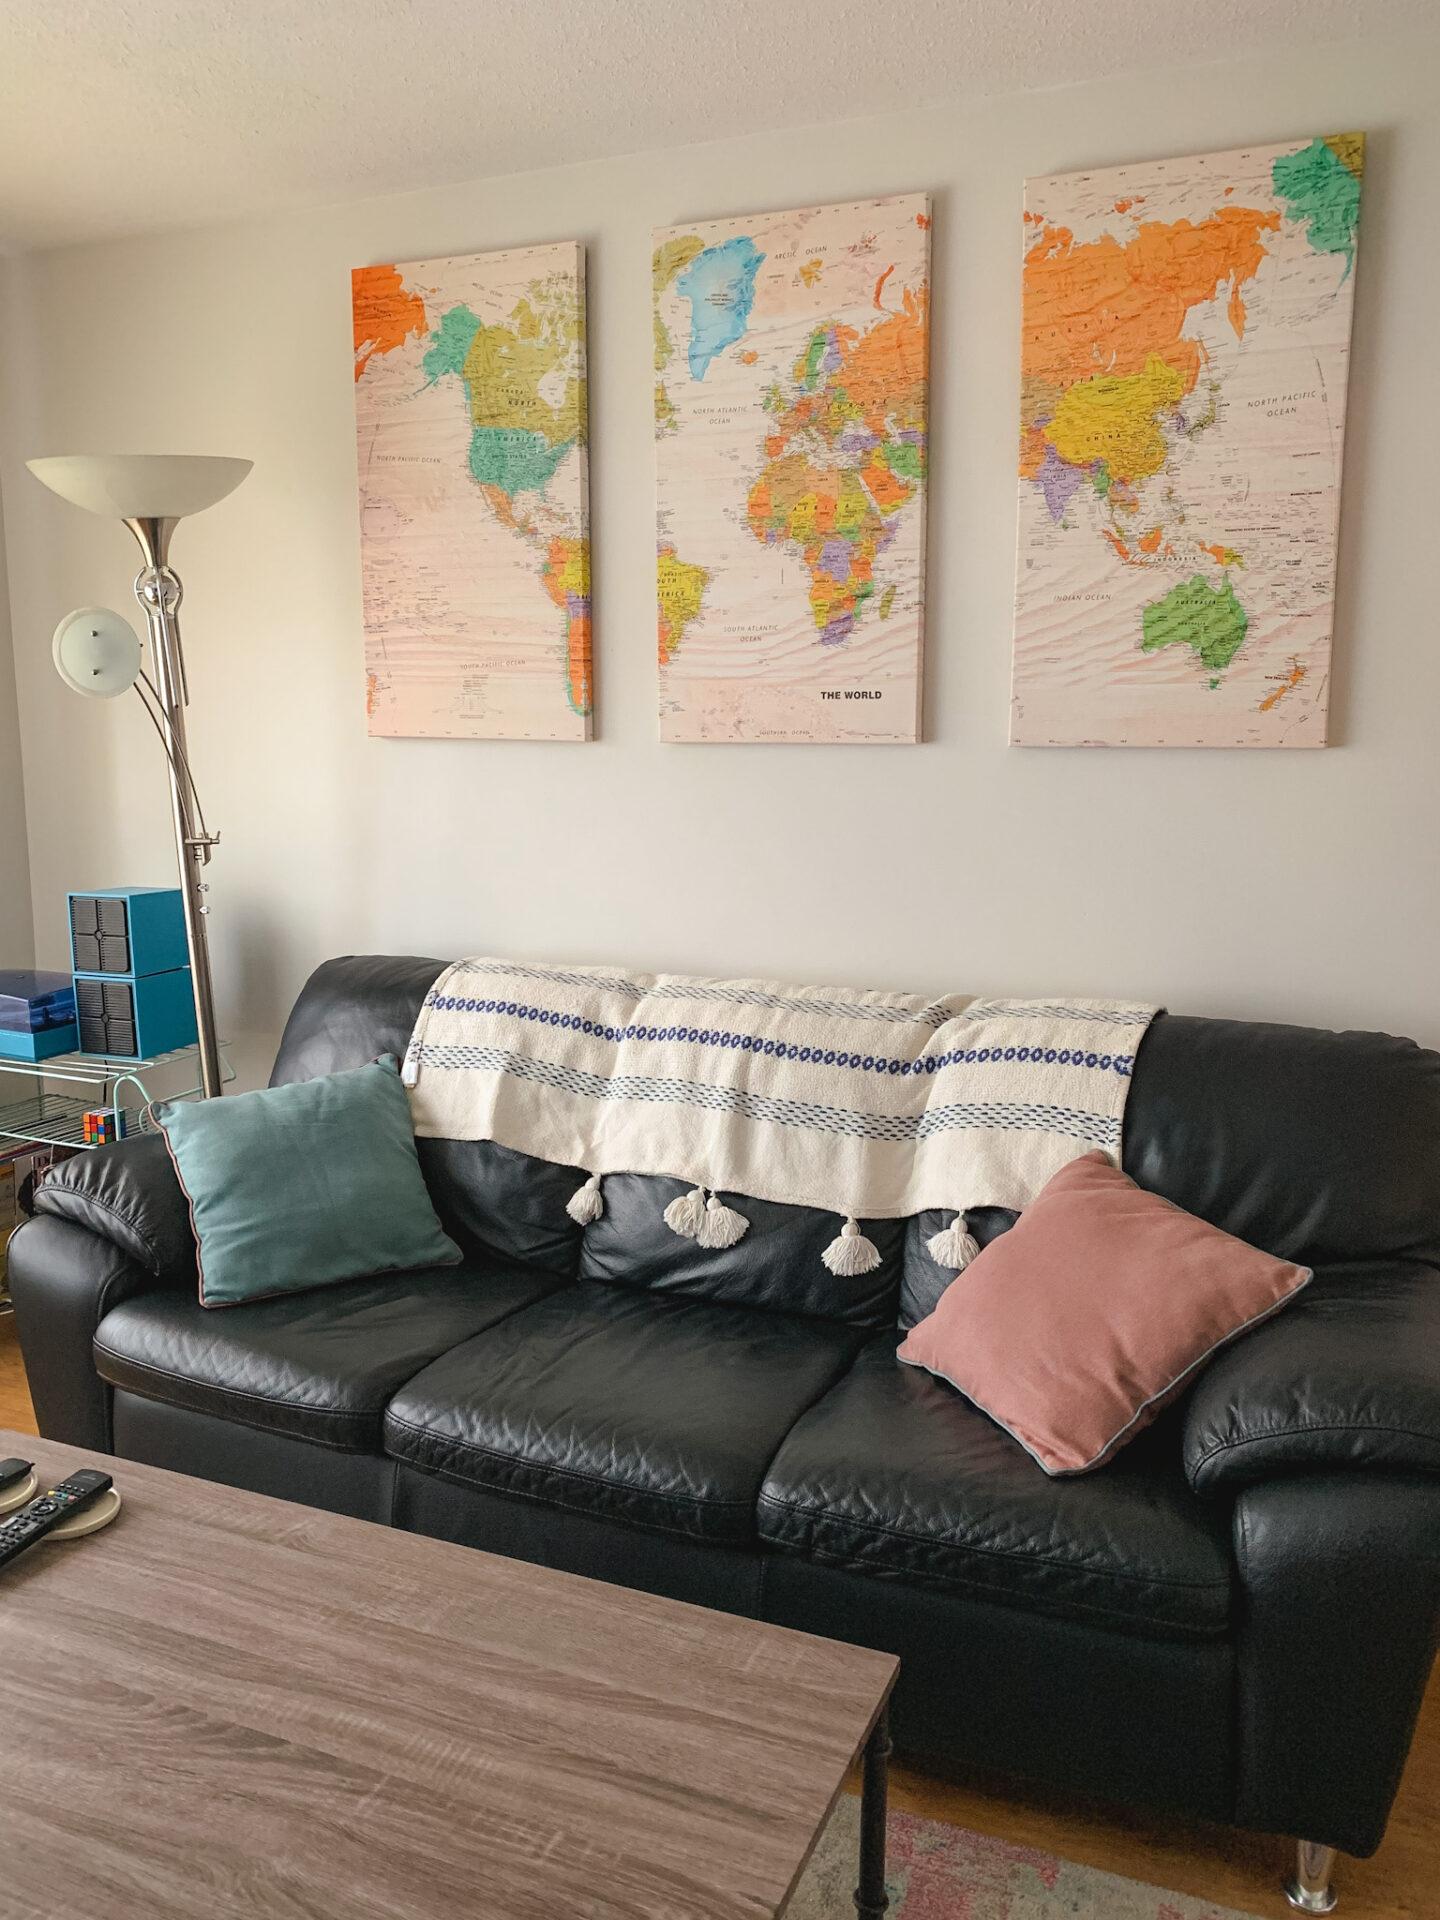 Airbnb in Golden, British Columbia